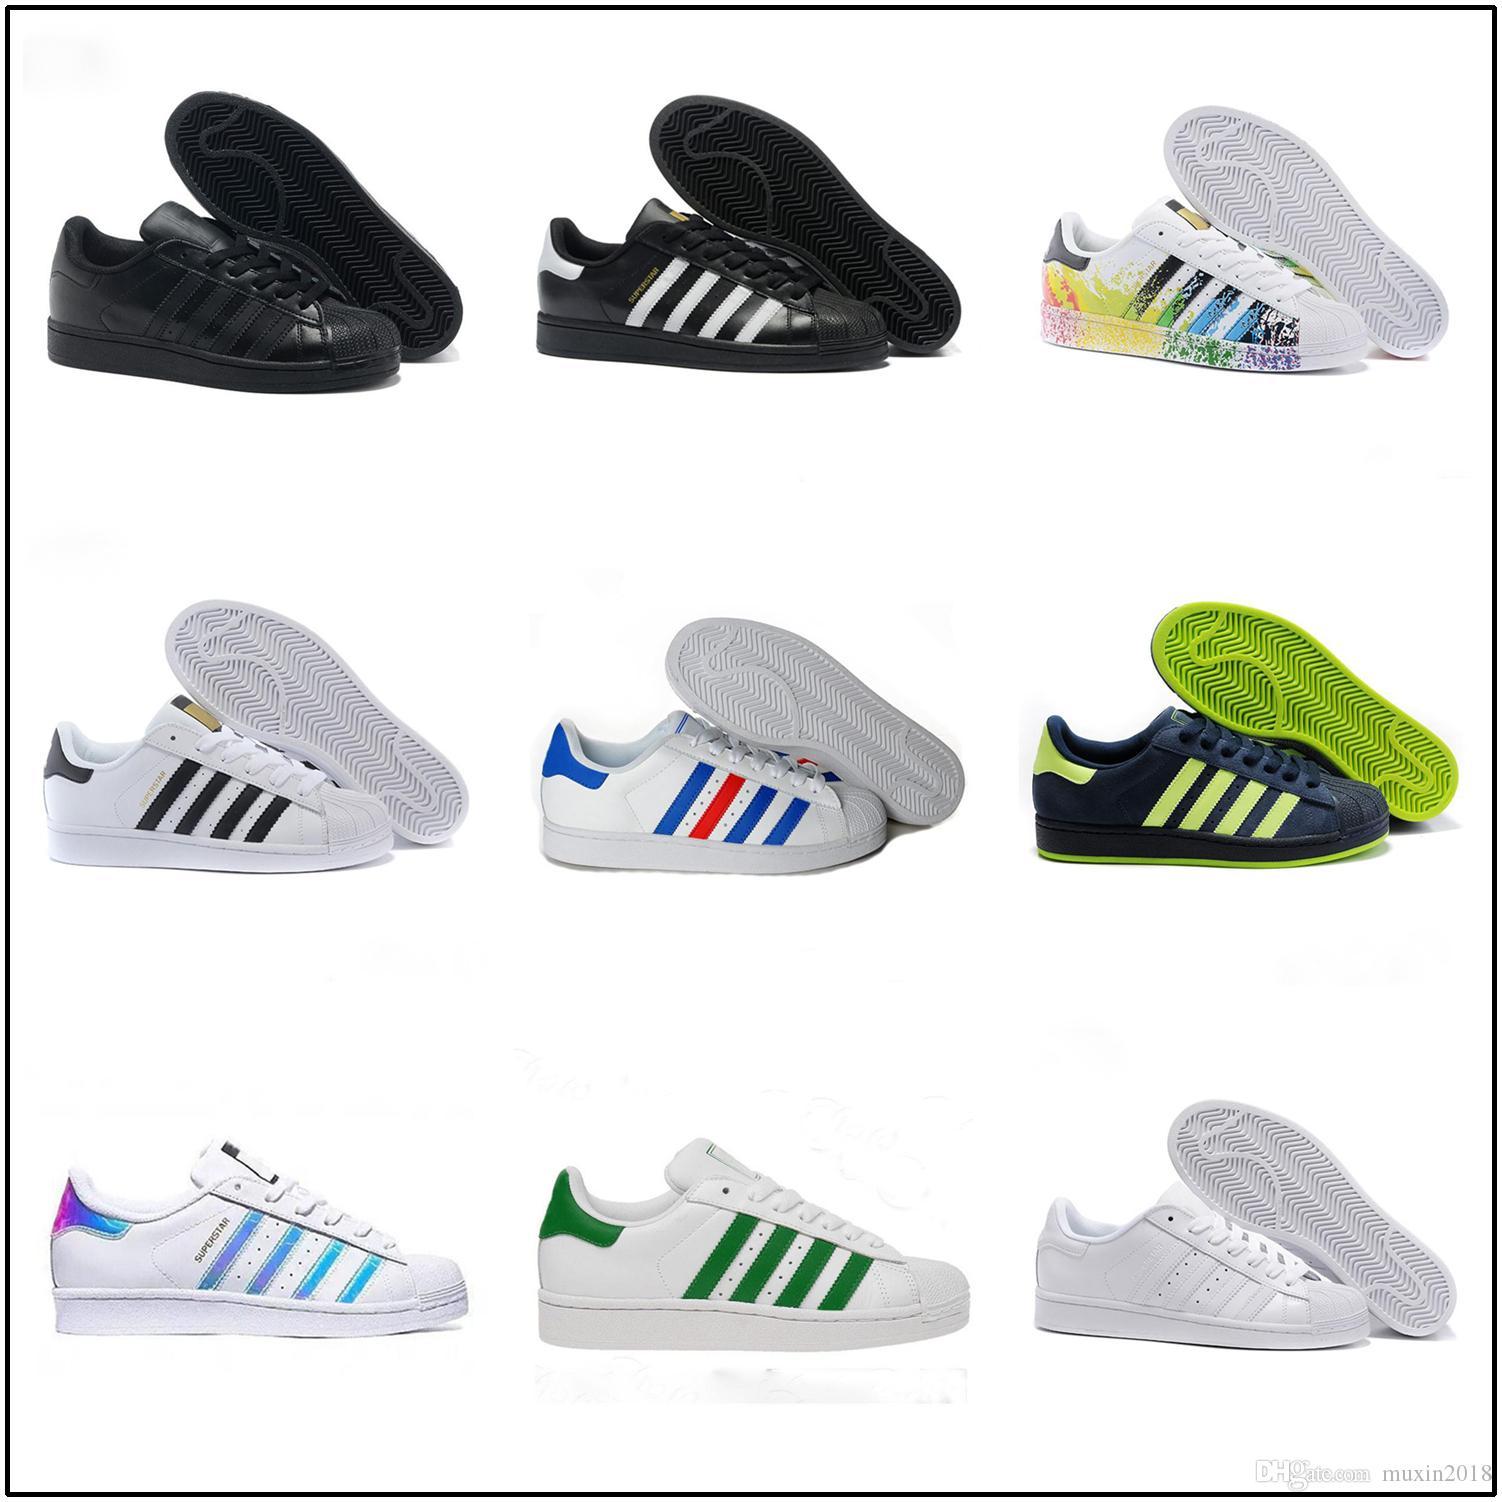 Mens Smith Plates Adidas Pour Femmes Hot Sell Stan Original Chaussures De Superstar Sport 2018 Mode c5j3Aq4RL